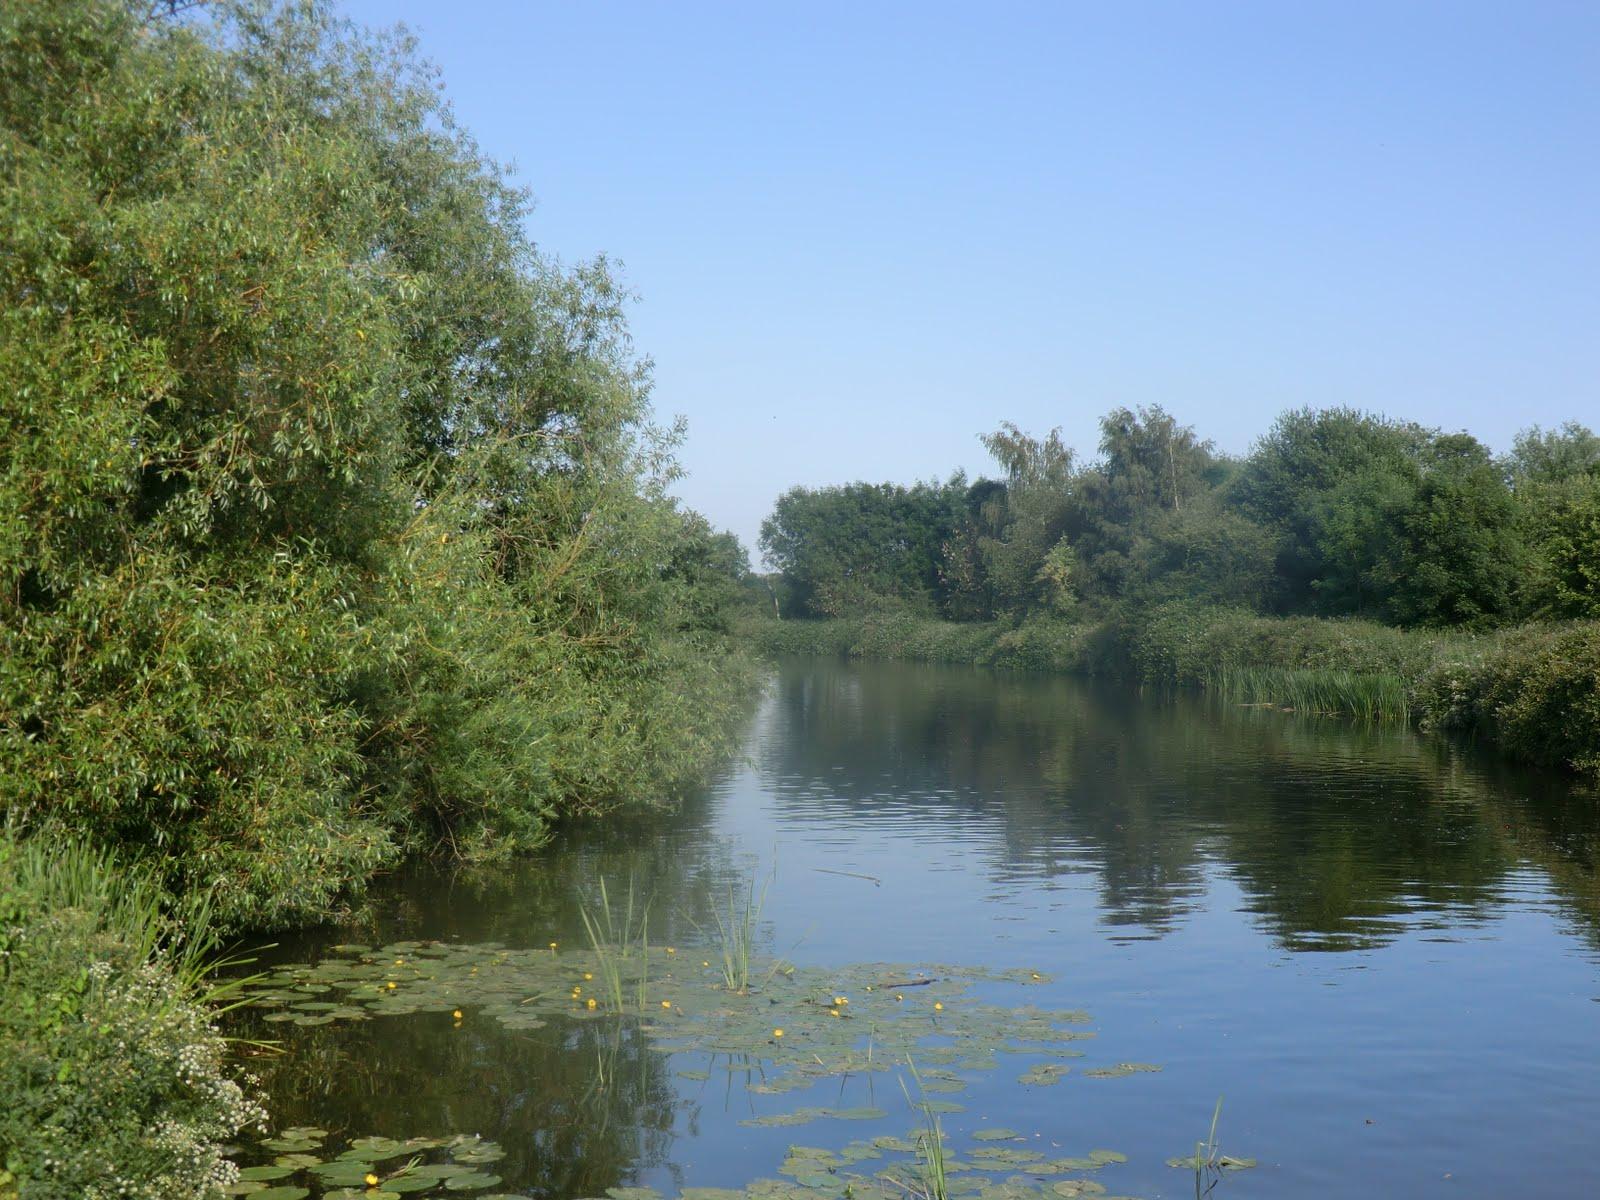 CIMG2012 River Medway